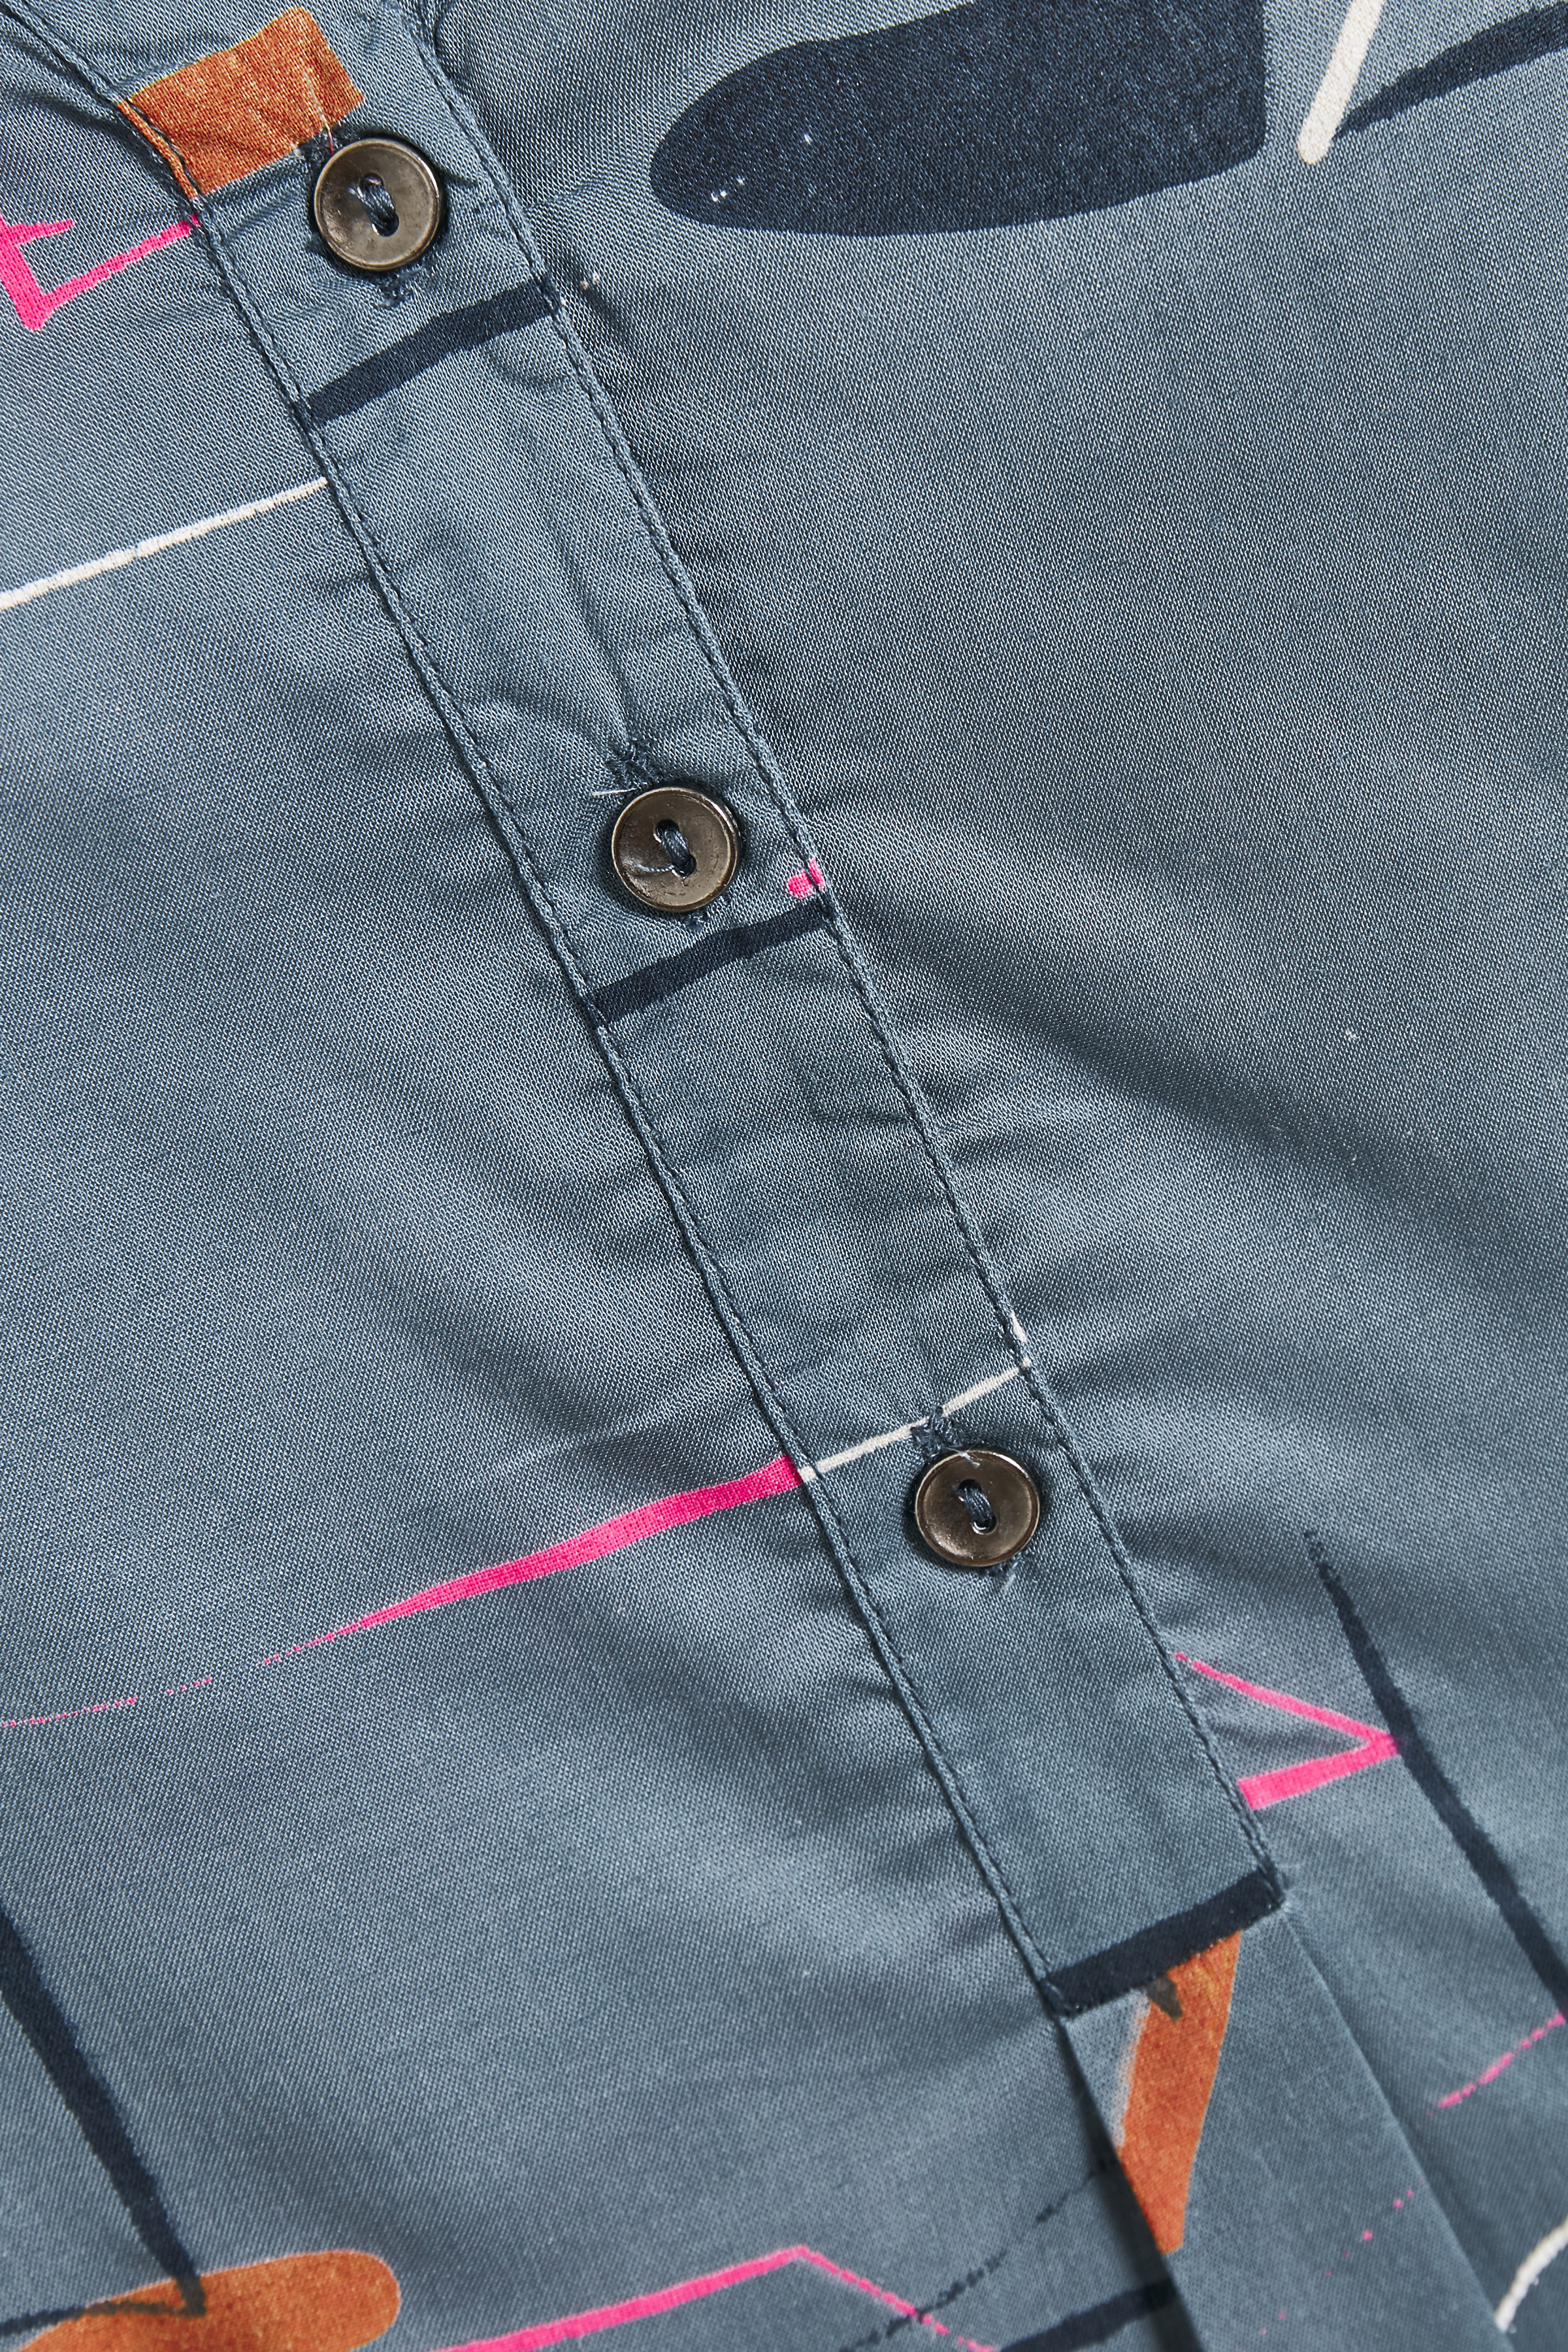 Dimblå/pink Tunika från Bon'A Parte – Köp Dimblå/pink Tunika från stl. S-2XL här